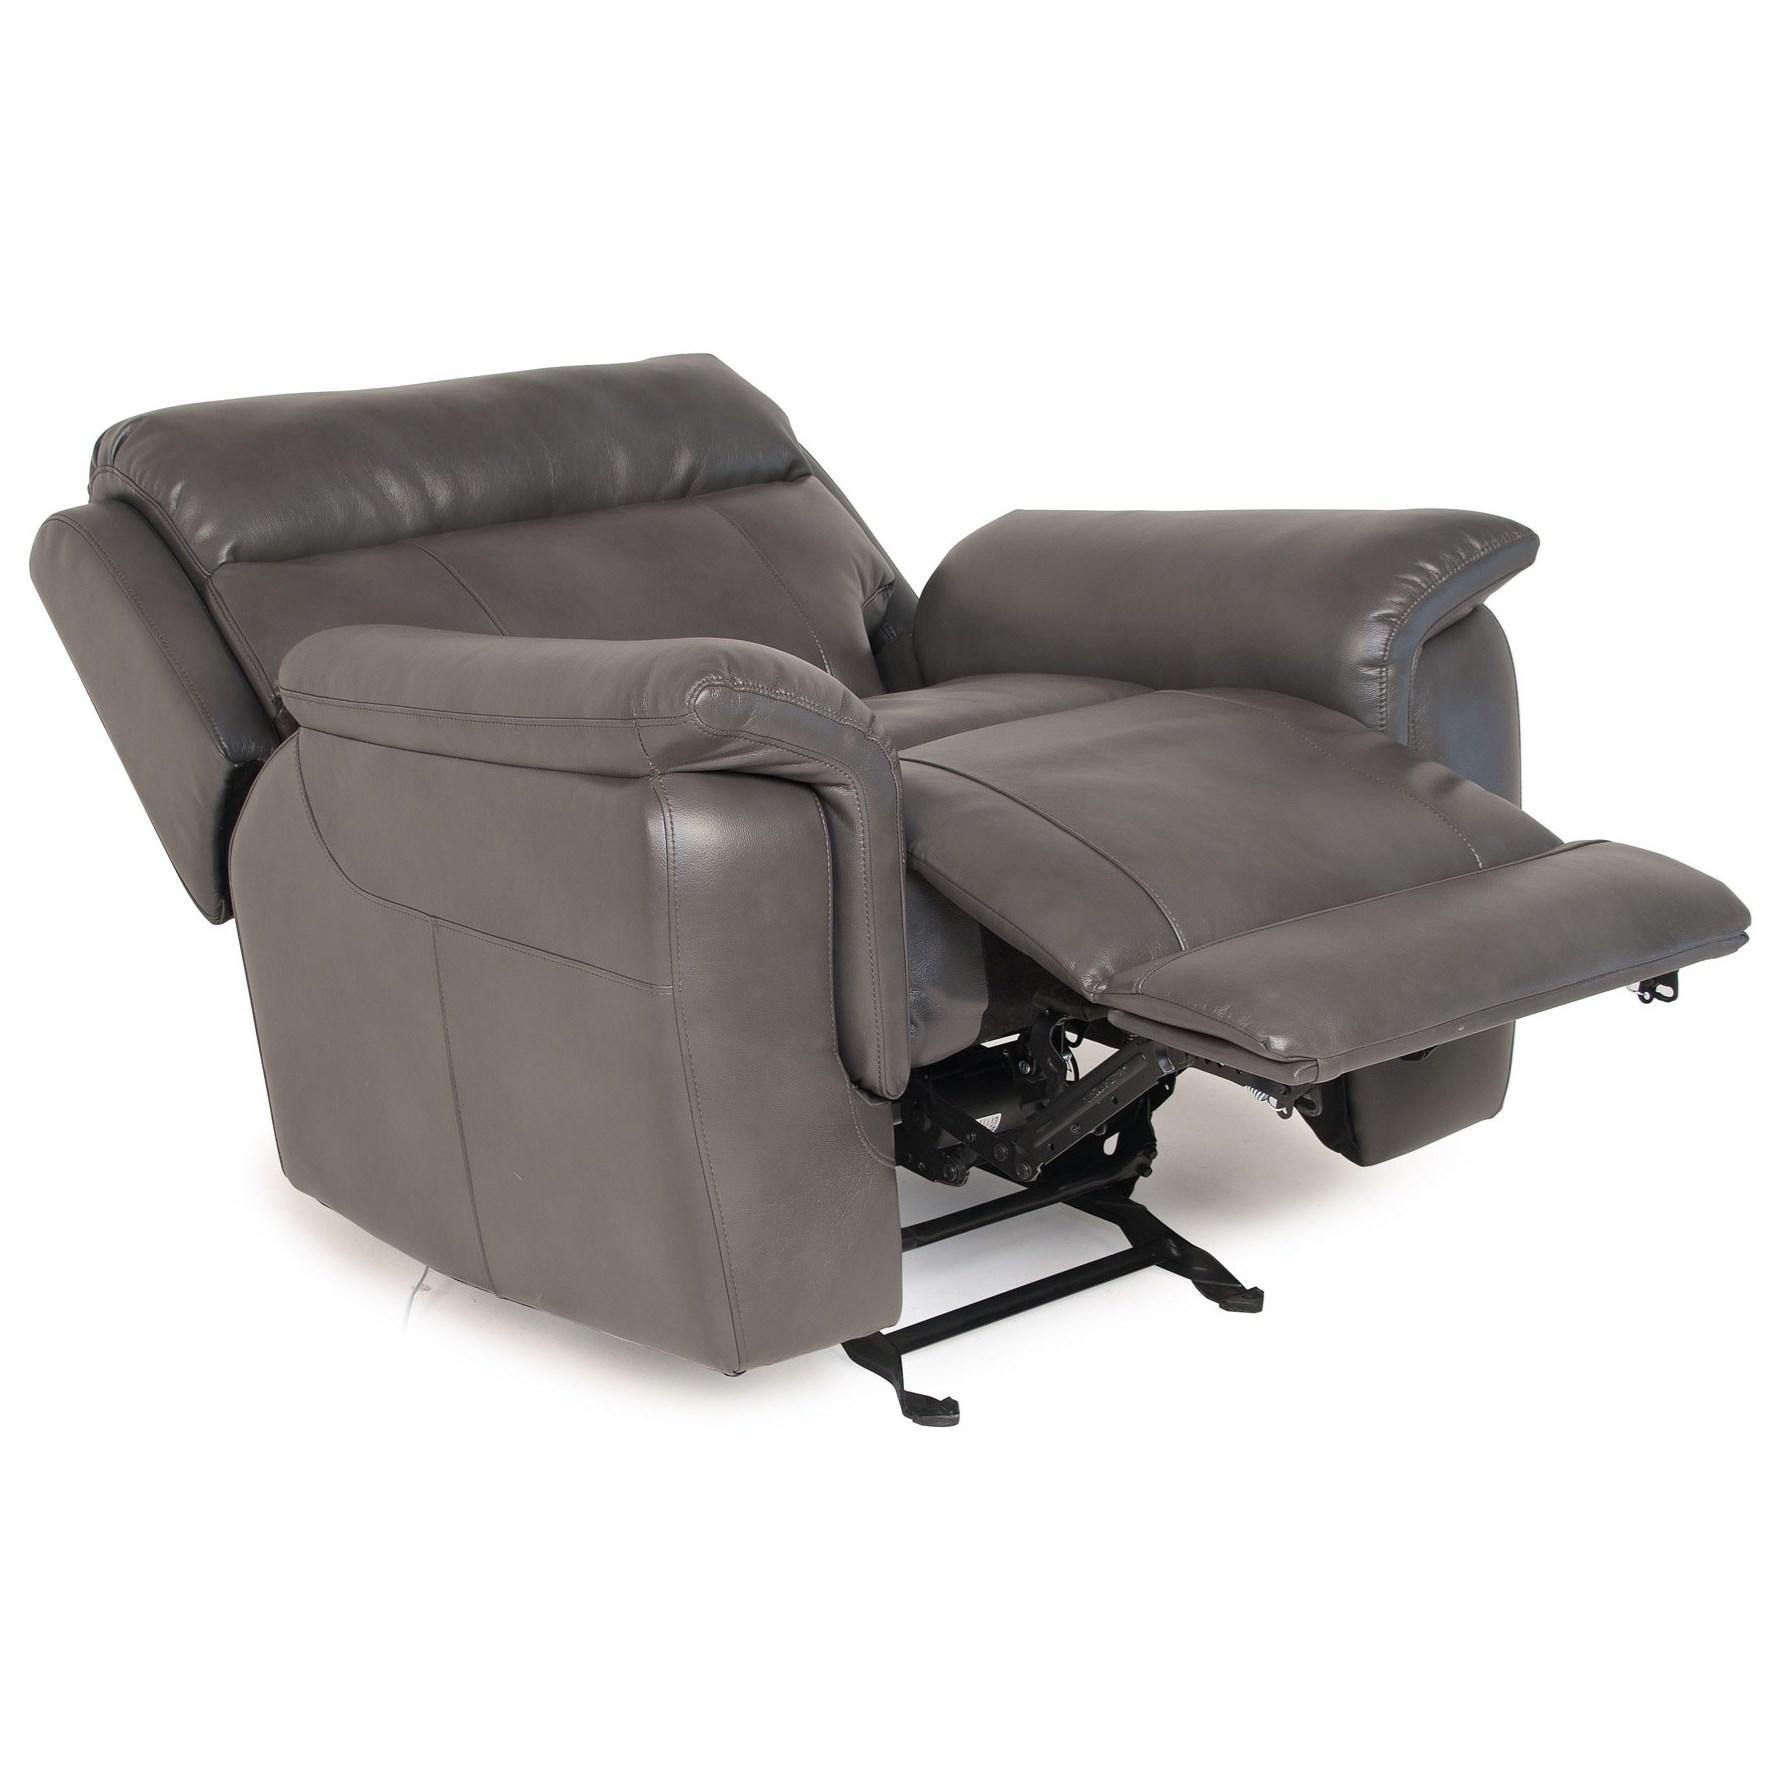 Steve Silver Dakota Lay Flat Glider Reclining Chair